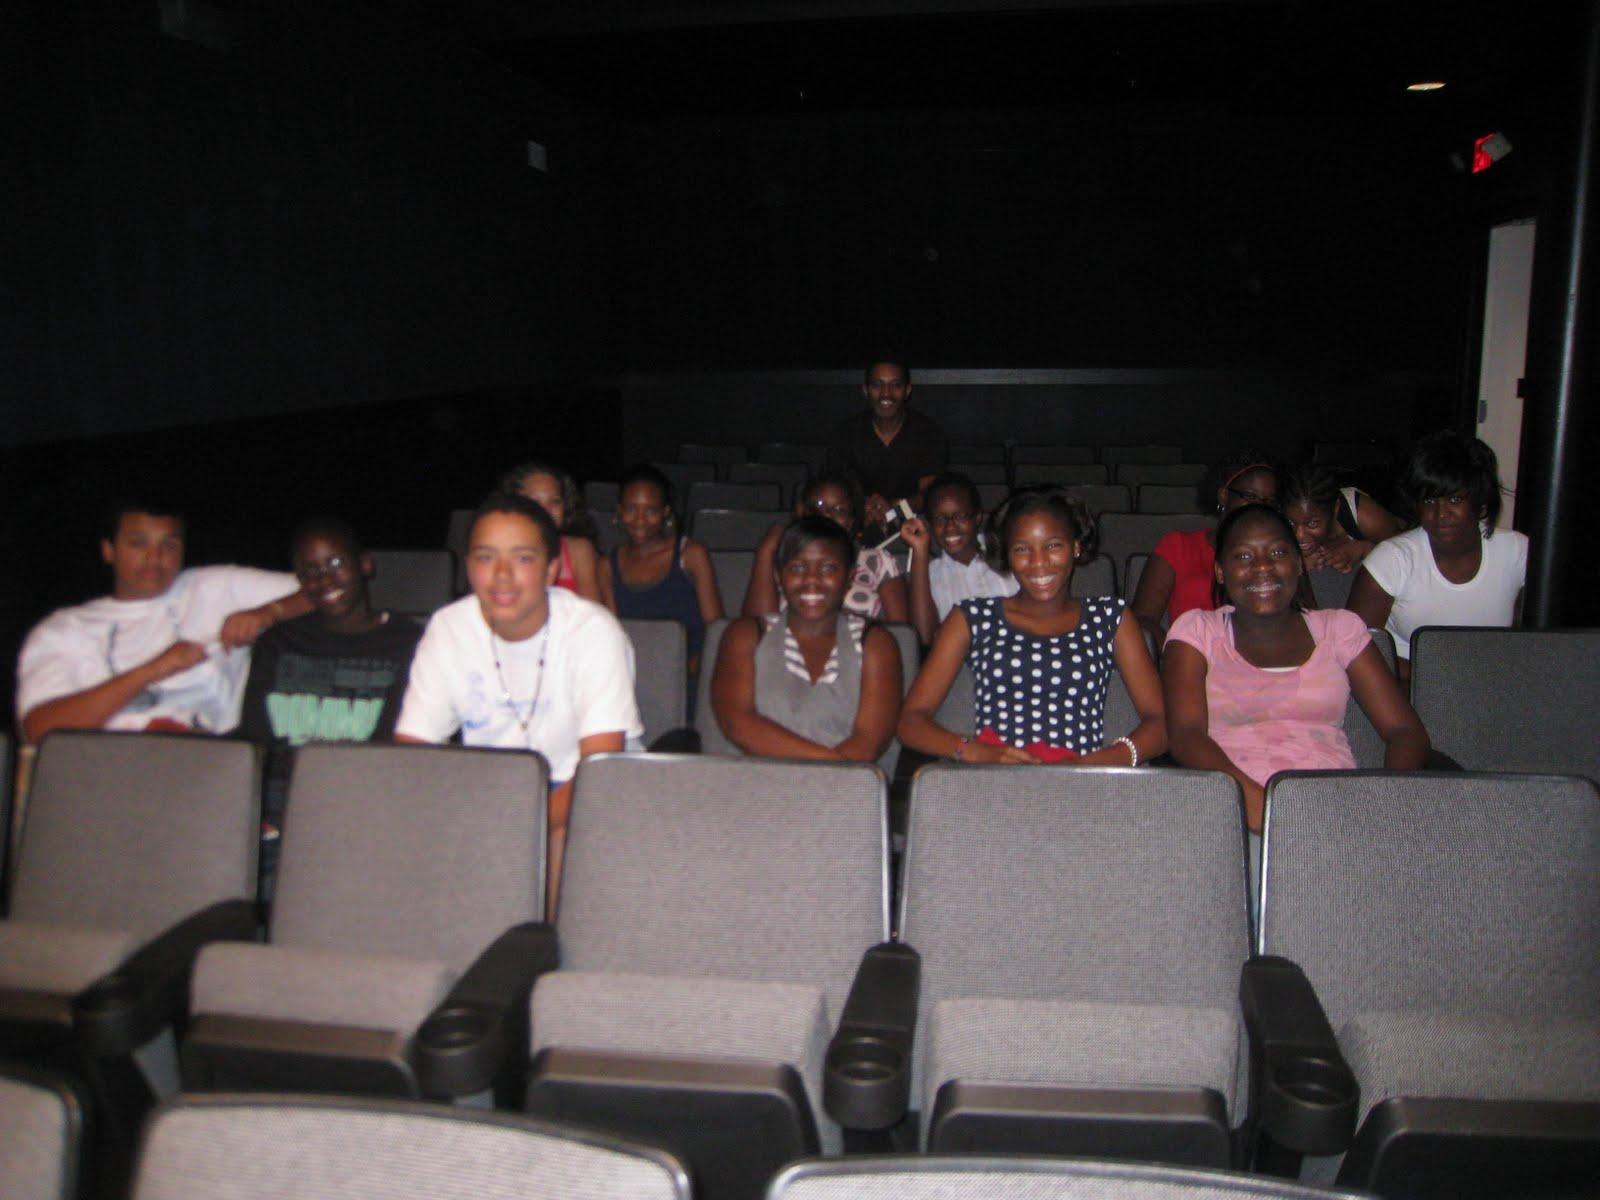 Aperture theater winston salem nc